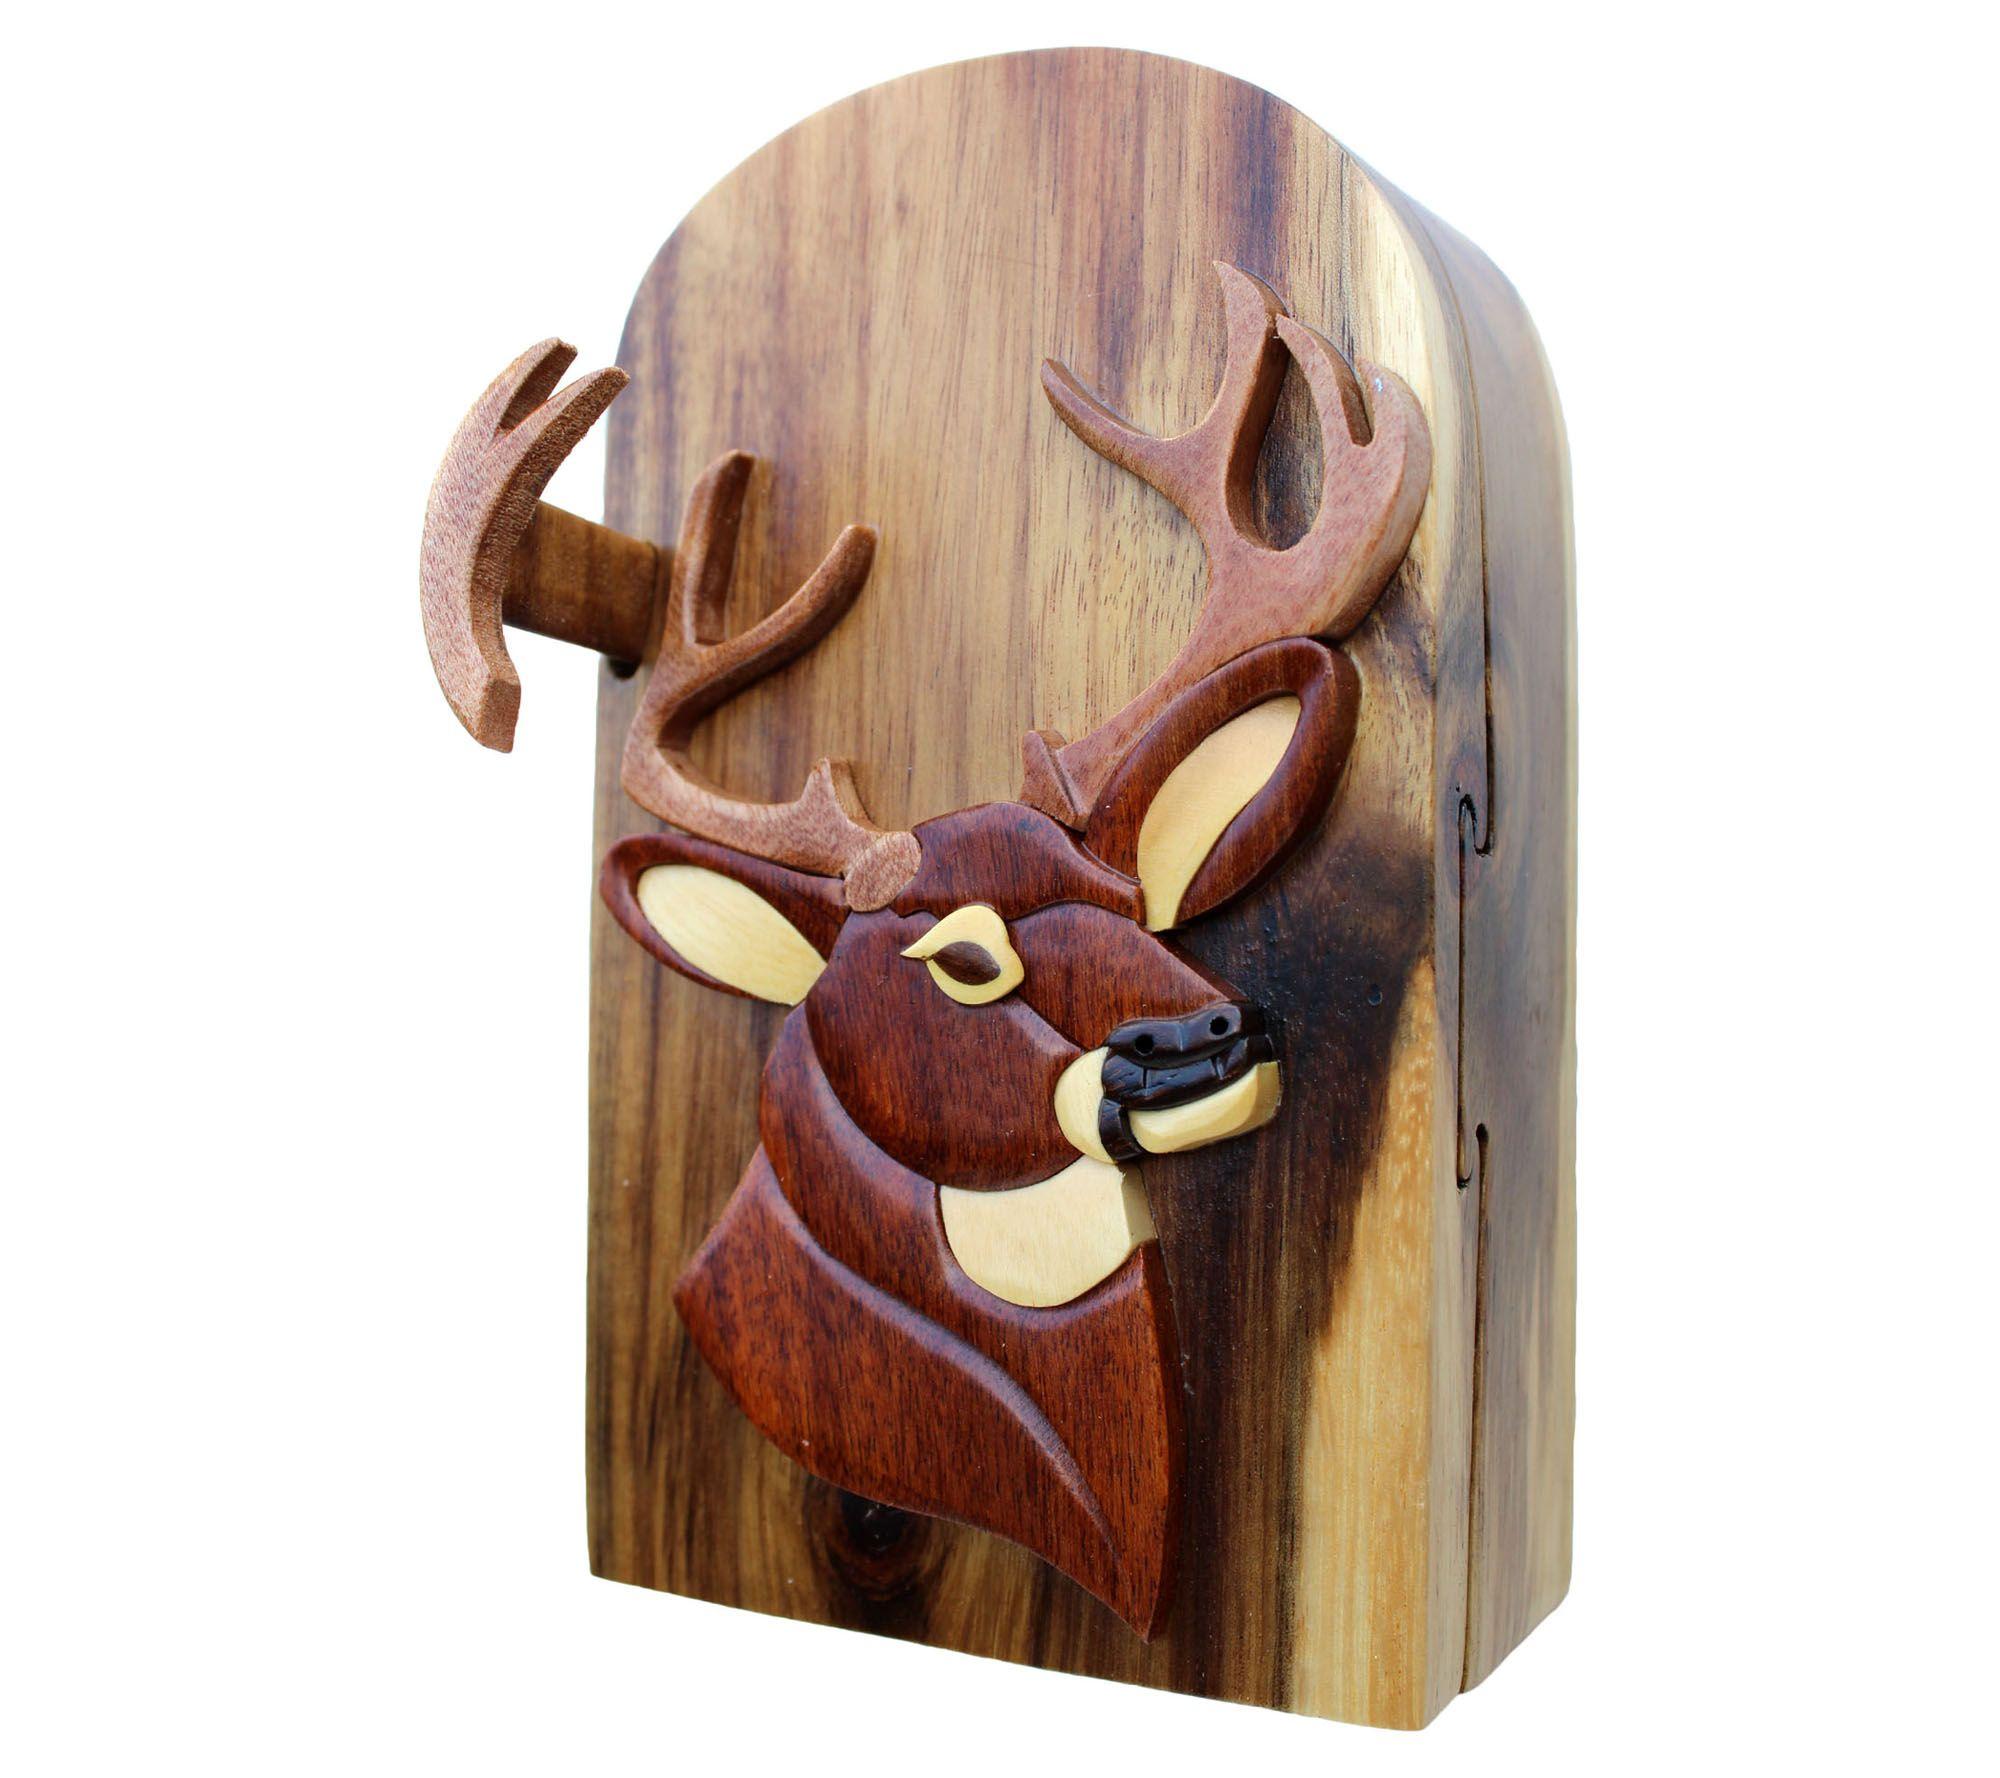 Carver Dan's Buck Puzzle Box with Magnet Closures — QVC com